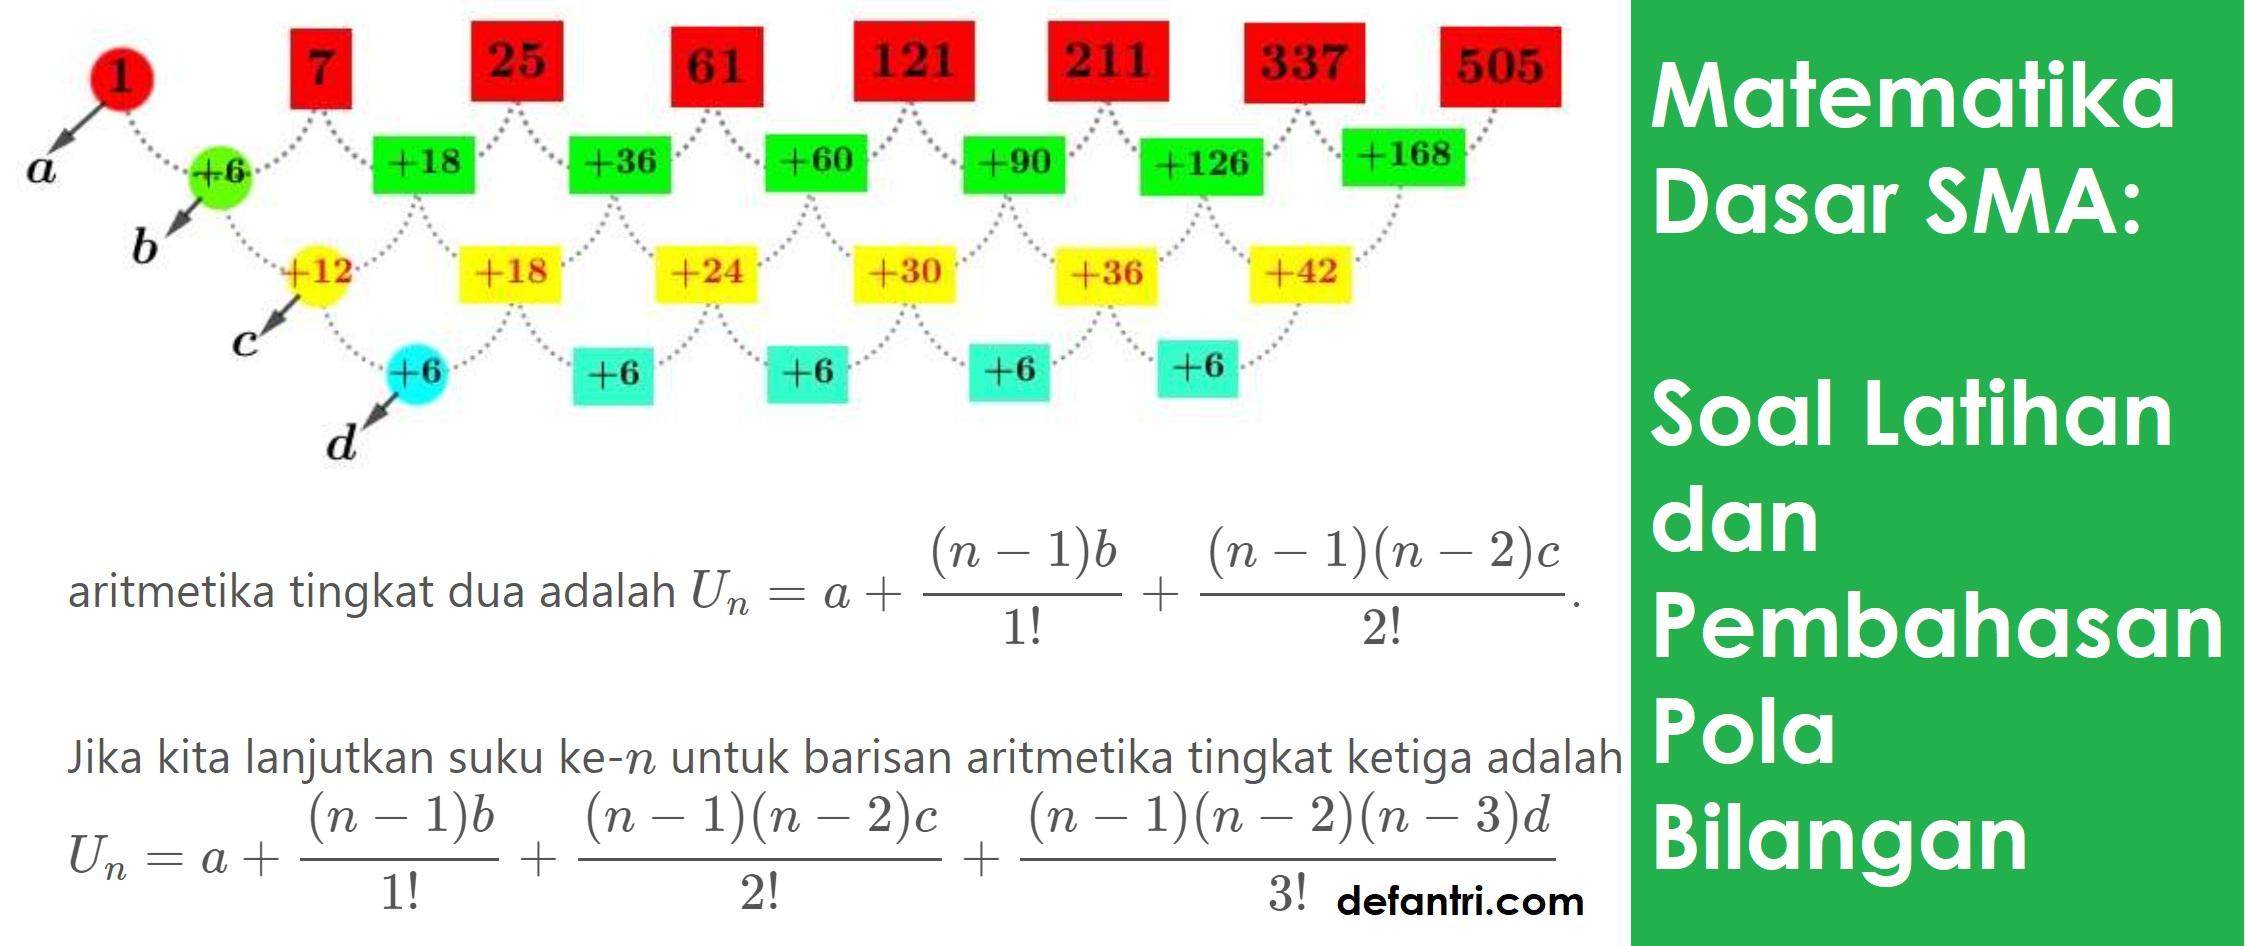 Matematika Dasar SMA: Soal Latihan dan Pembahasan Pola Bilangan